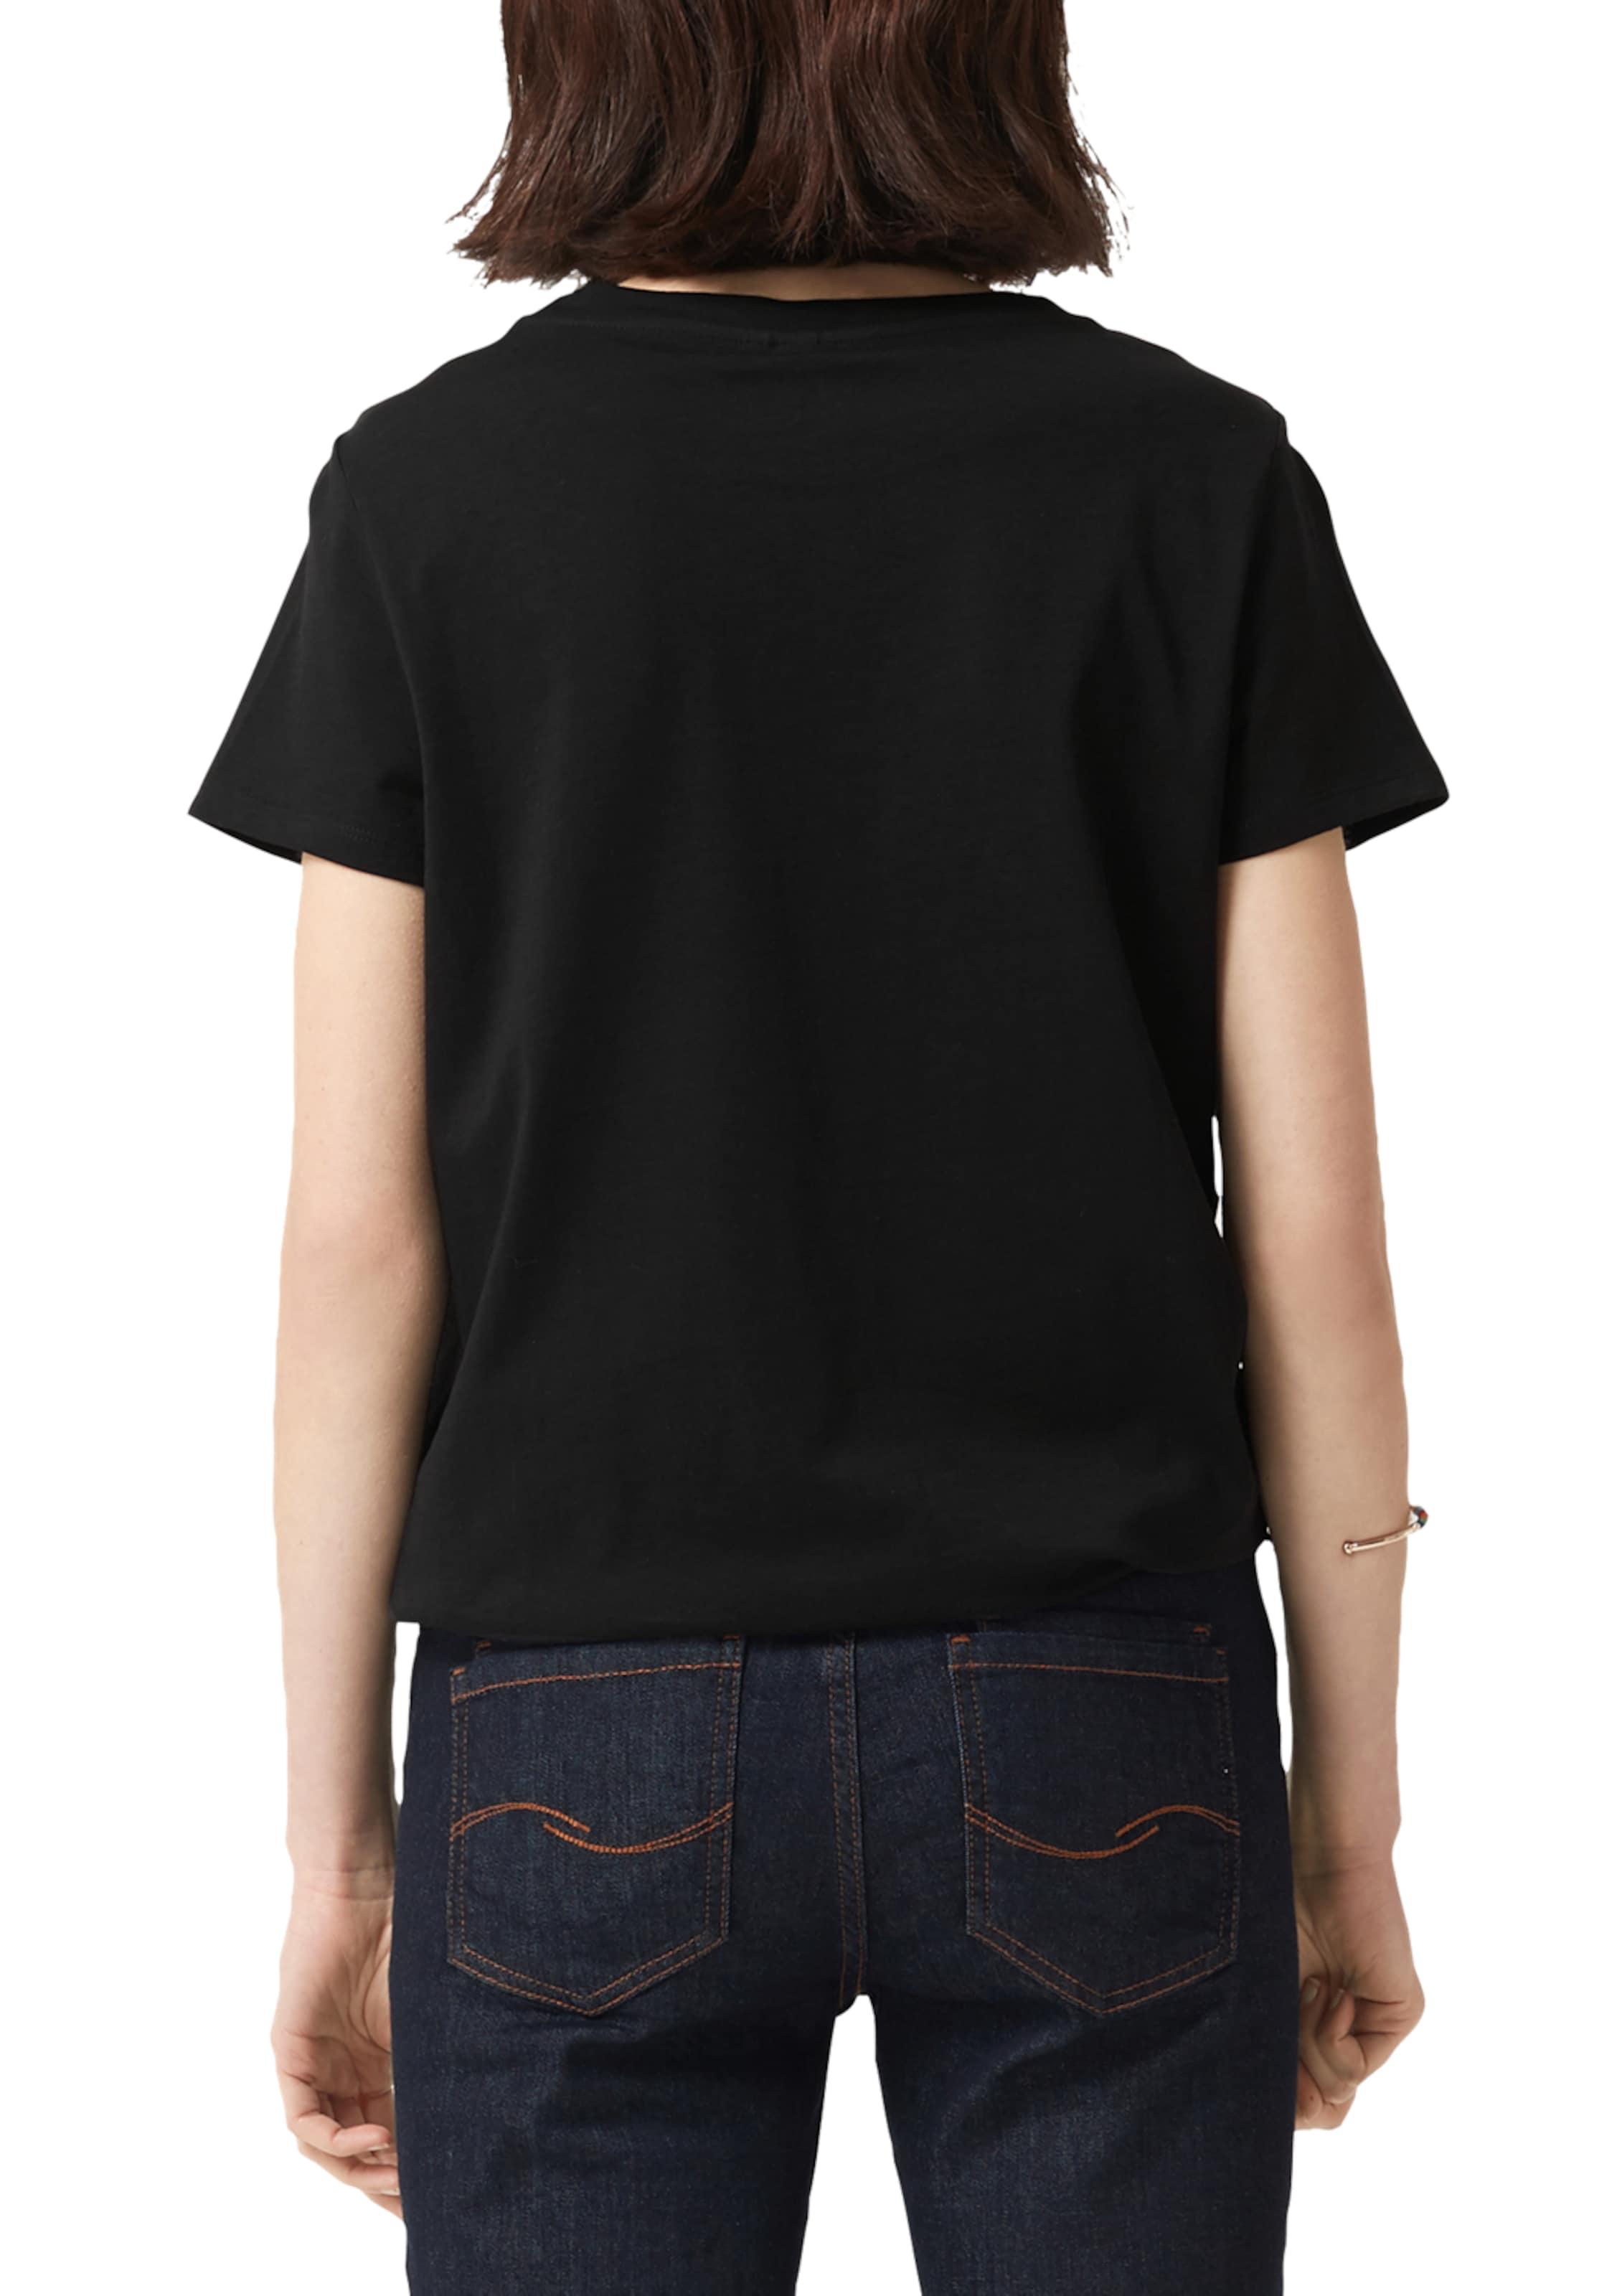 s Shirt By SchwarzWeiß Designed In Q N0vm8wn